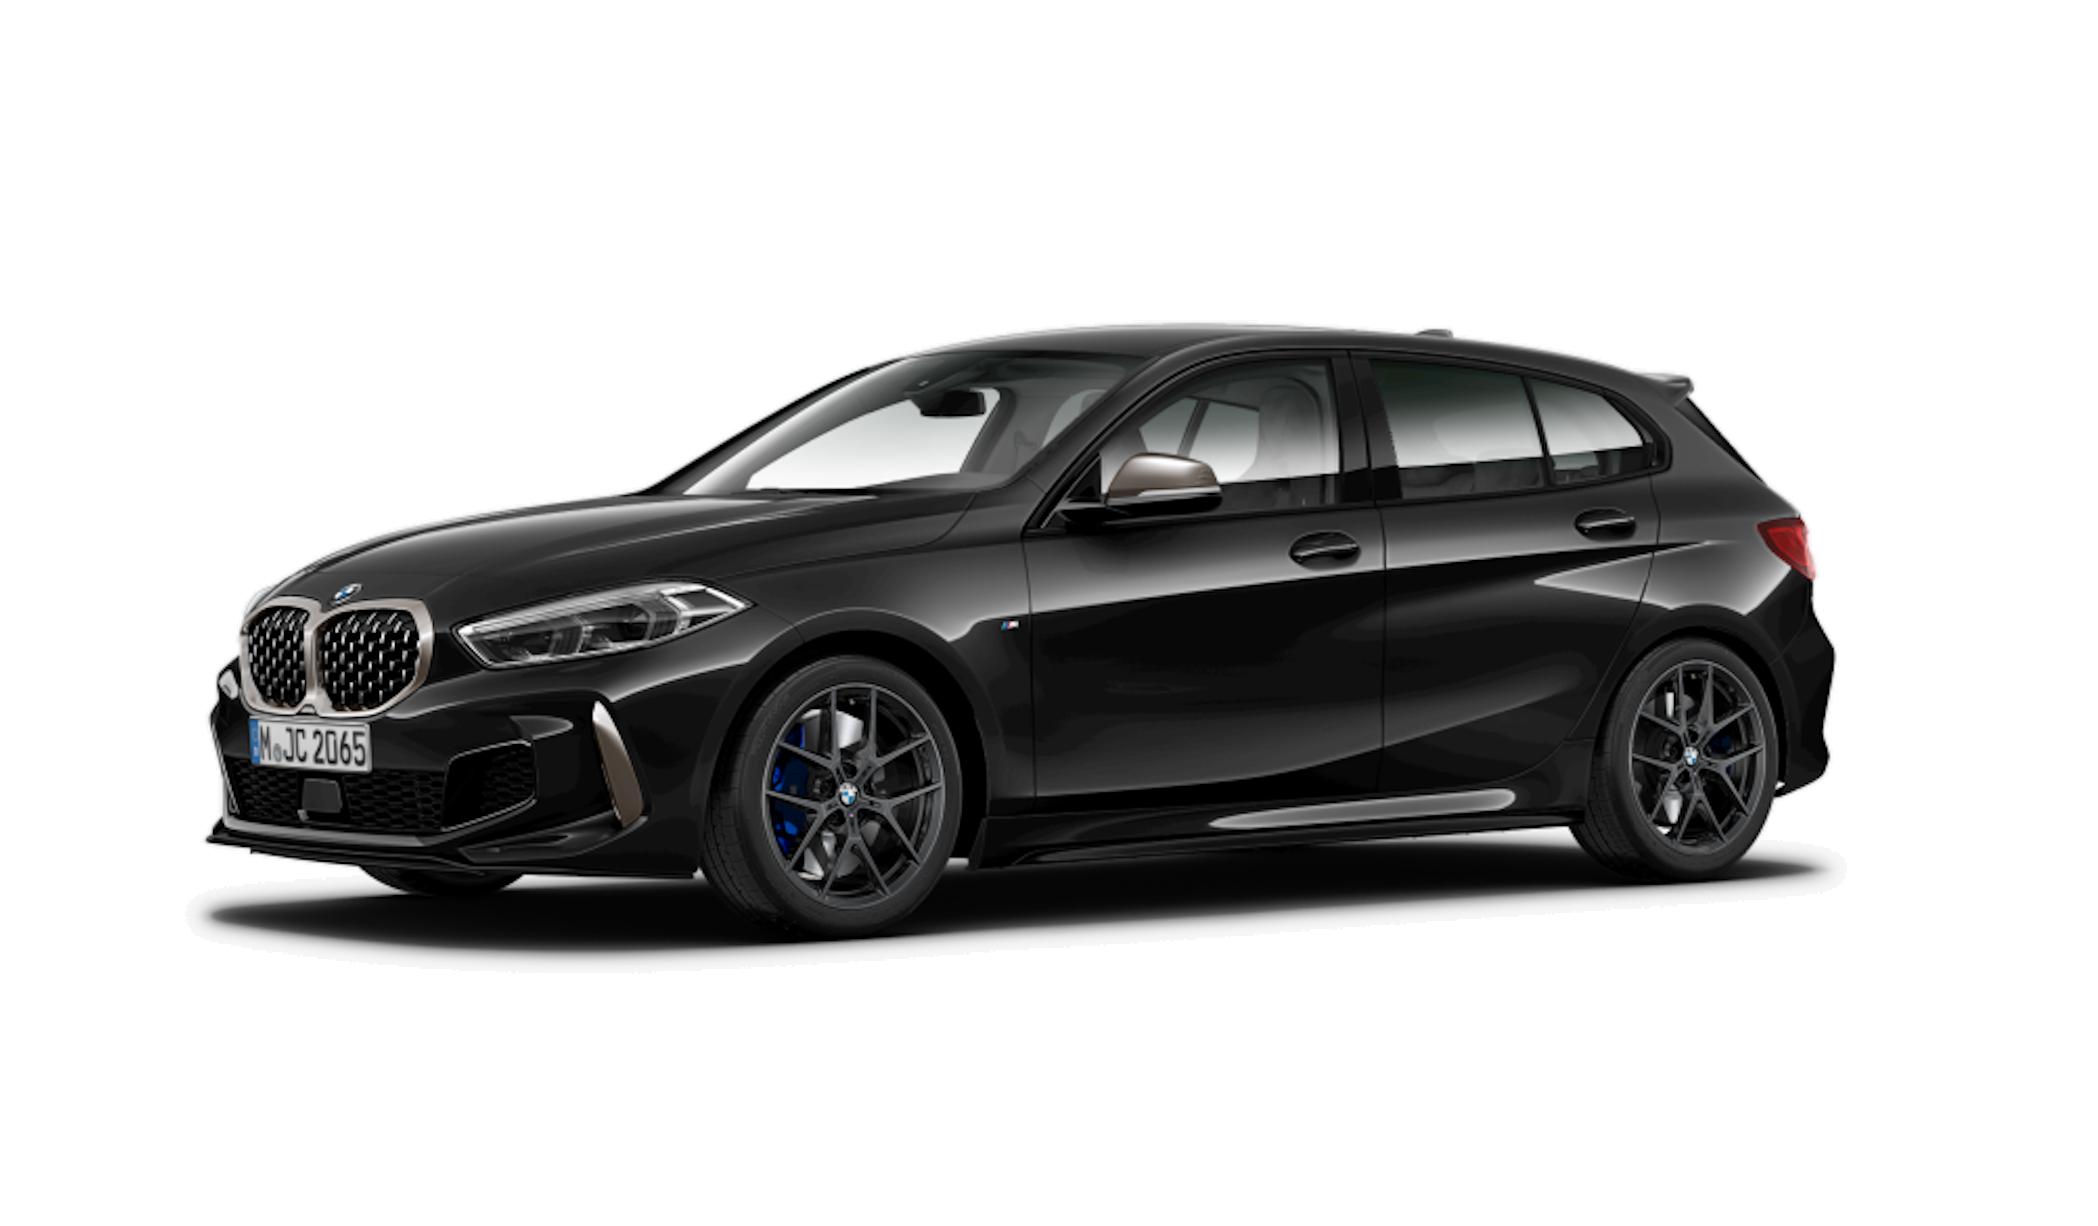 bmw 1 series 2020 116i in uae: new car prices, specs